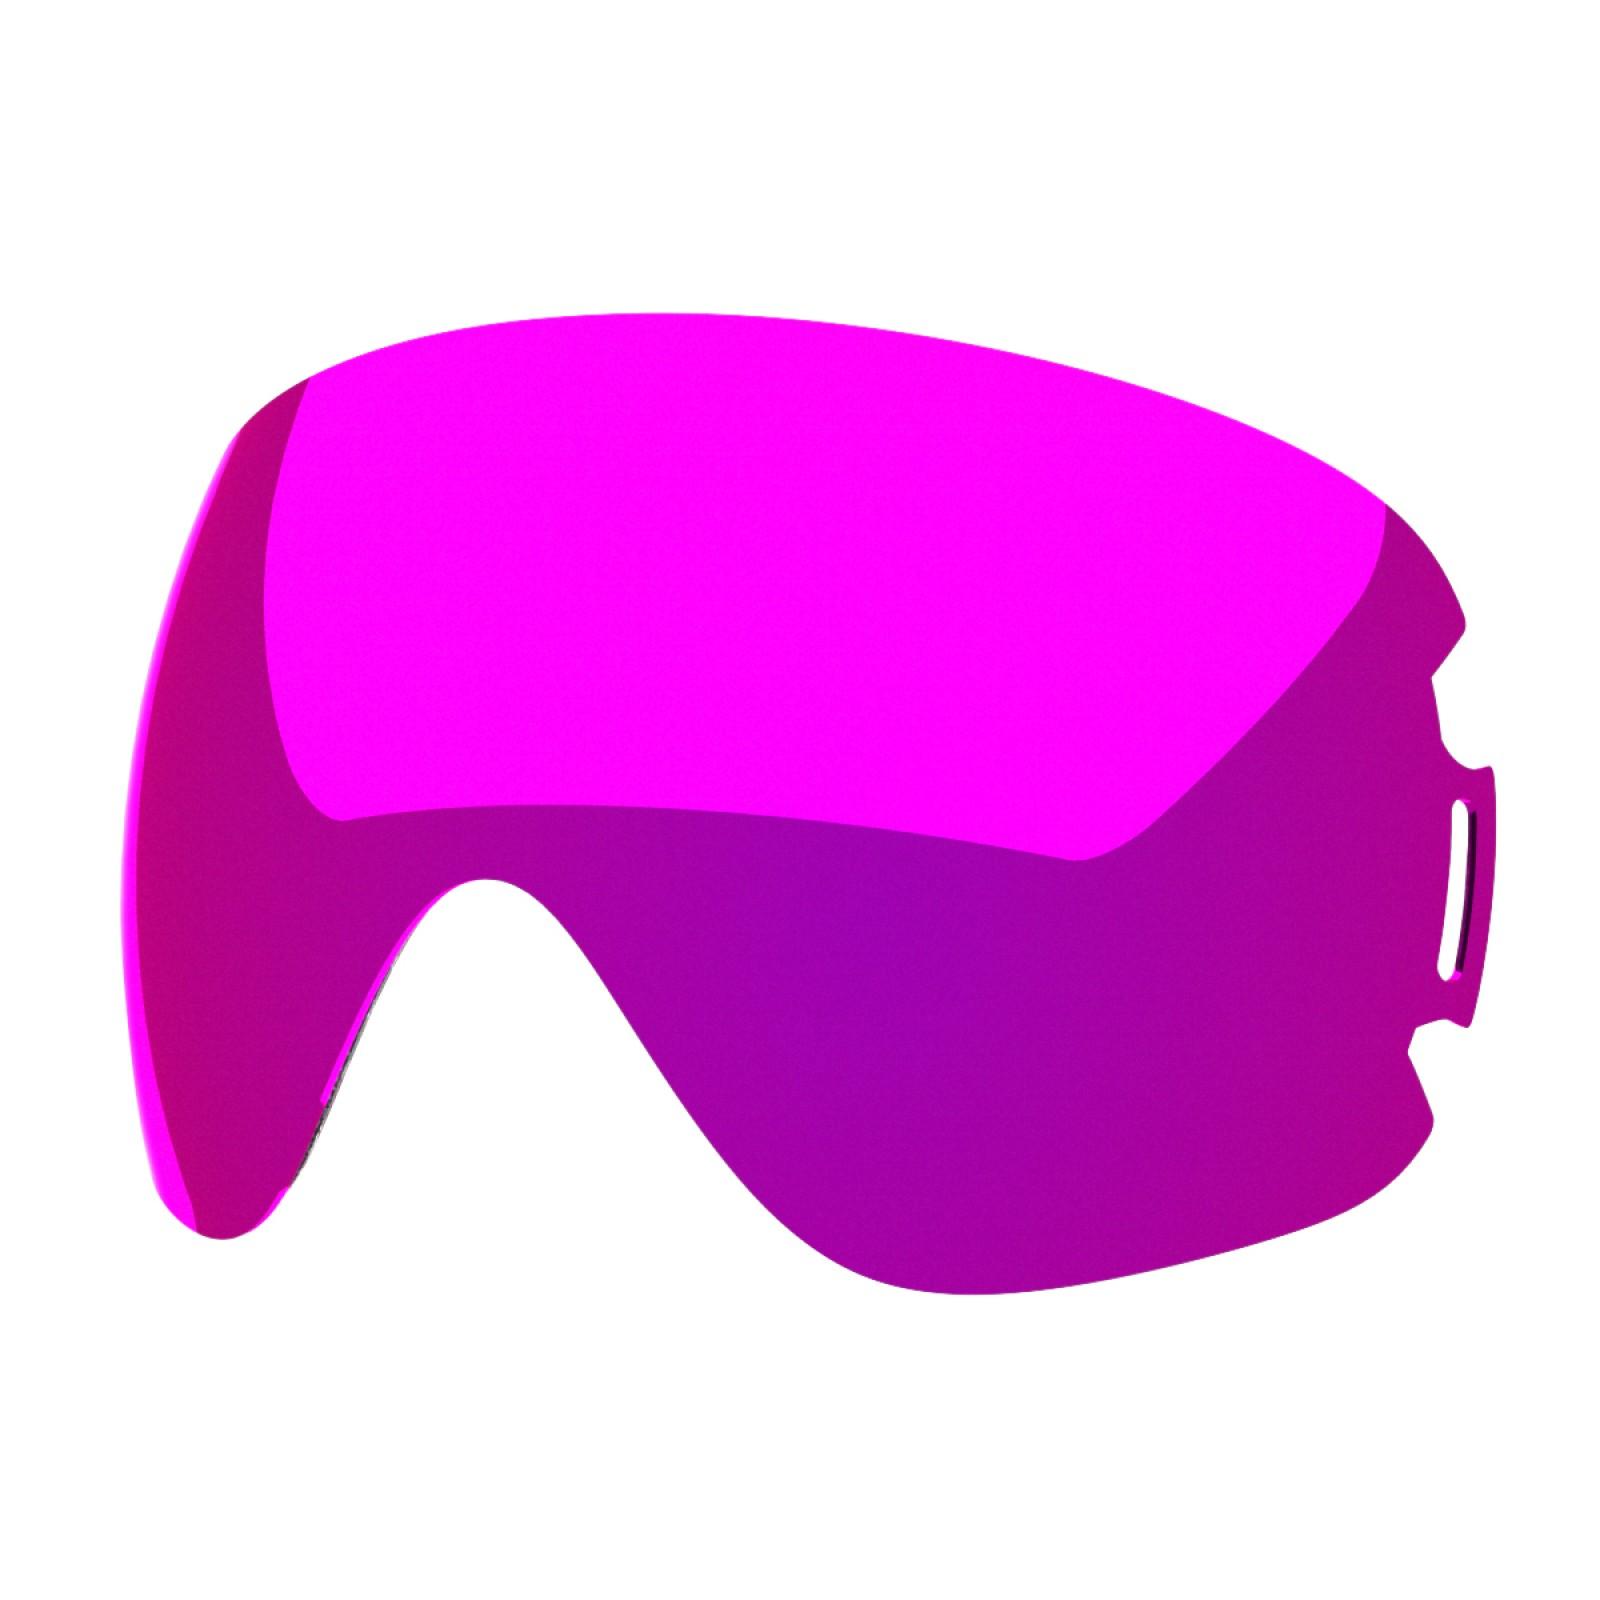 VIOLET MCI lens for  Open goggle